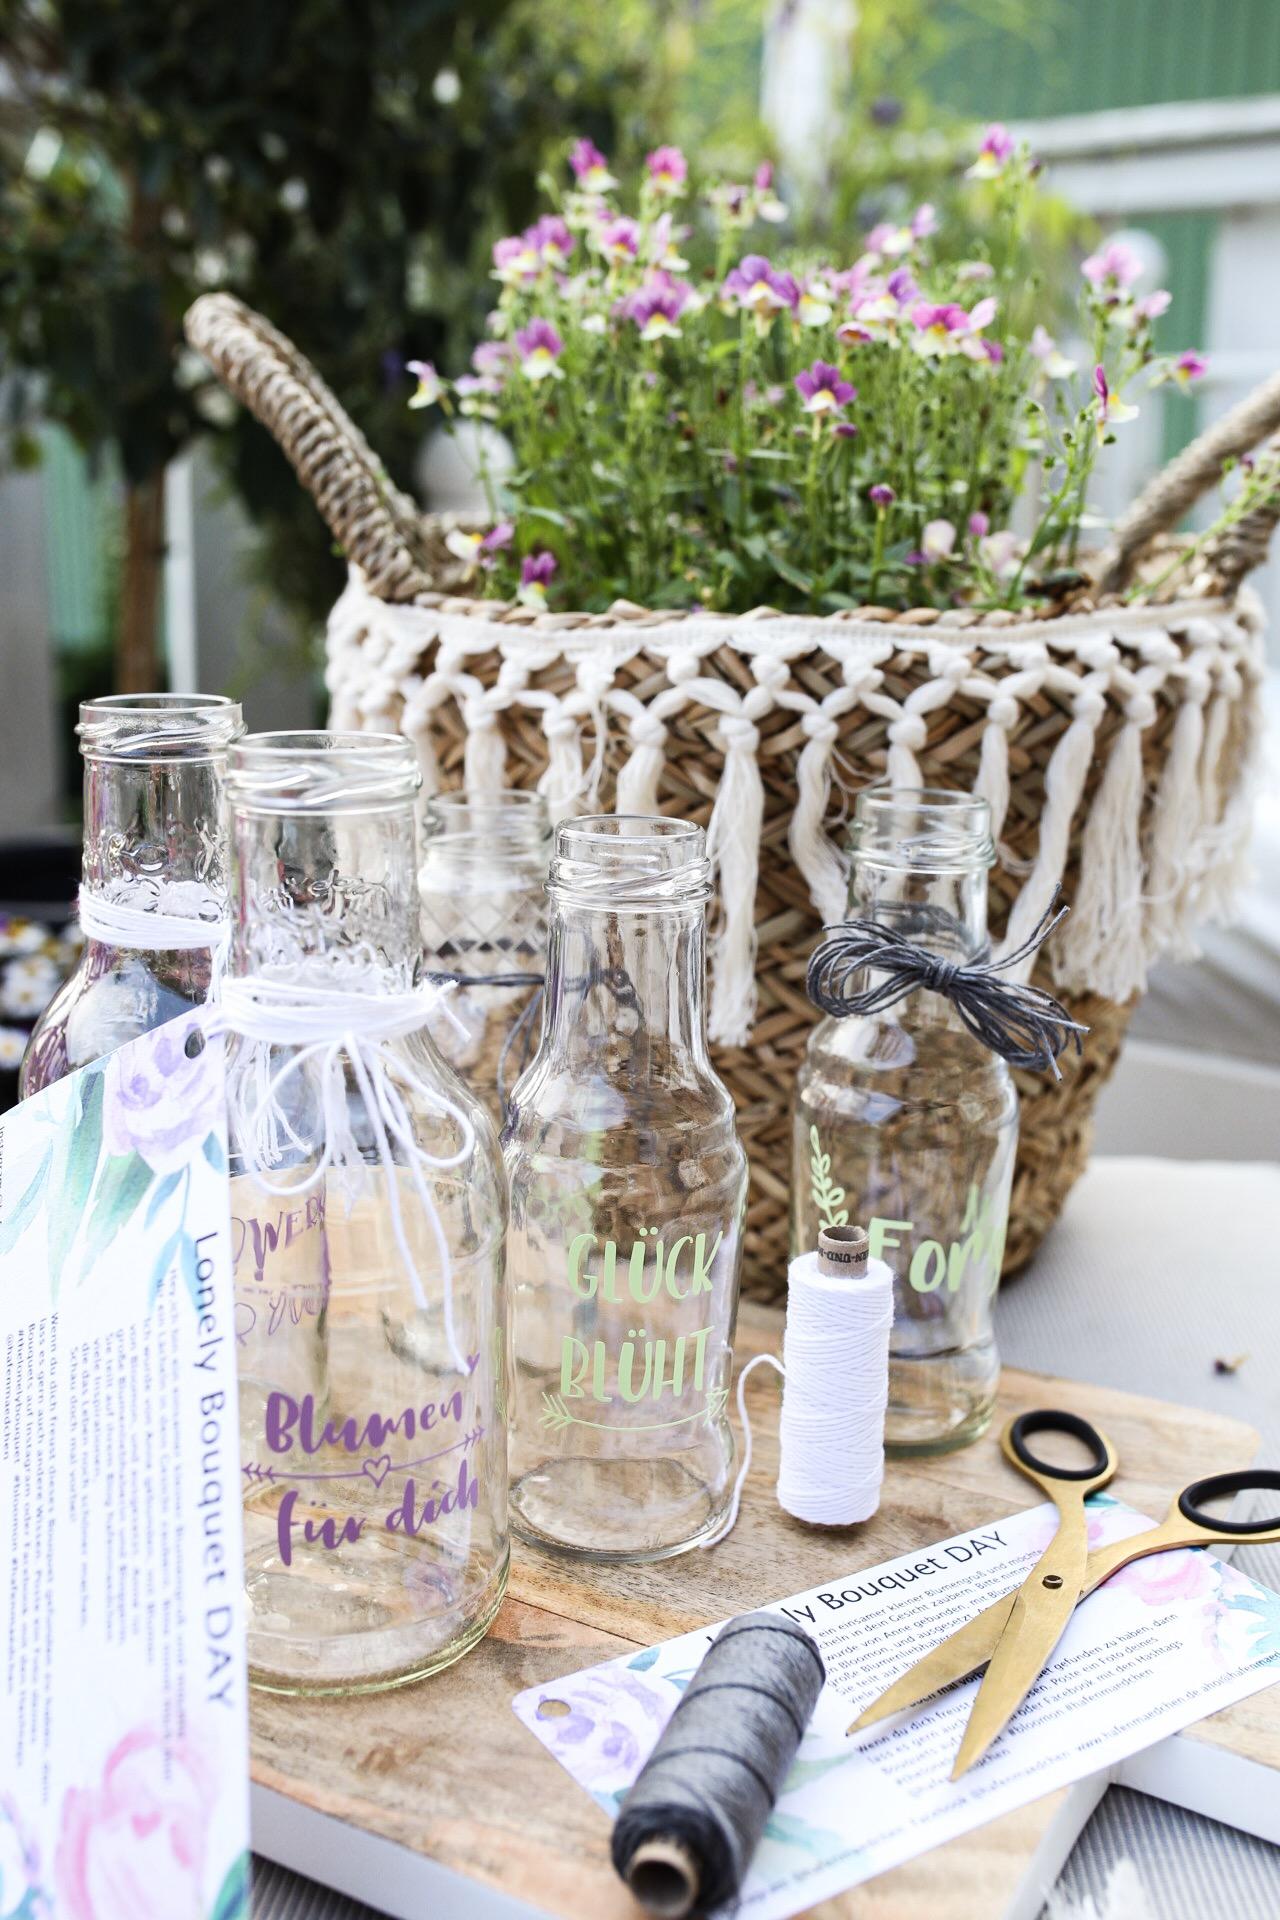 Lonely Bouquet Day - Upcycling Flaschen als Vase mit dem Plotter